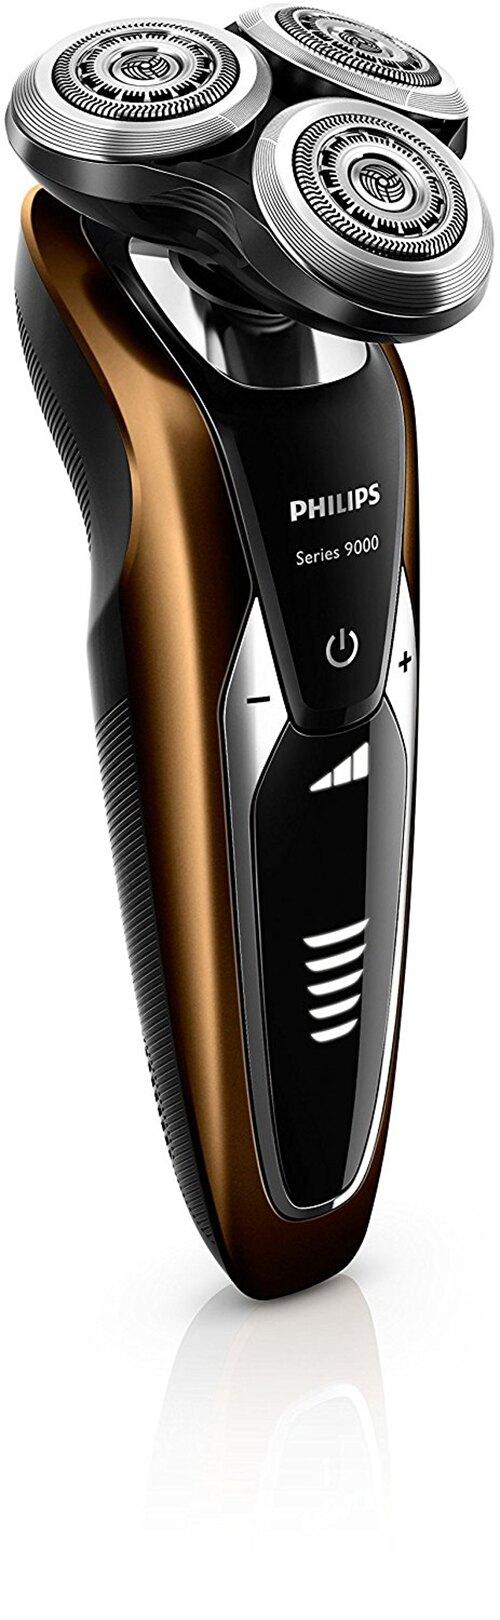 PHILIPS【日本代購】 飛利浦 9000系列 電動水洗刮鬍刀 S9511/12